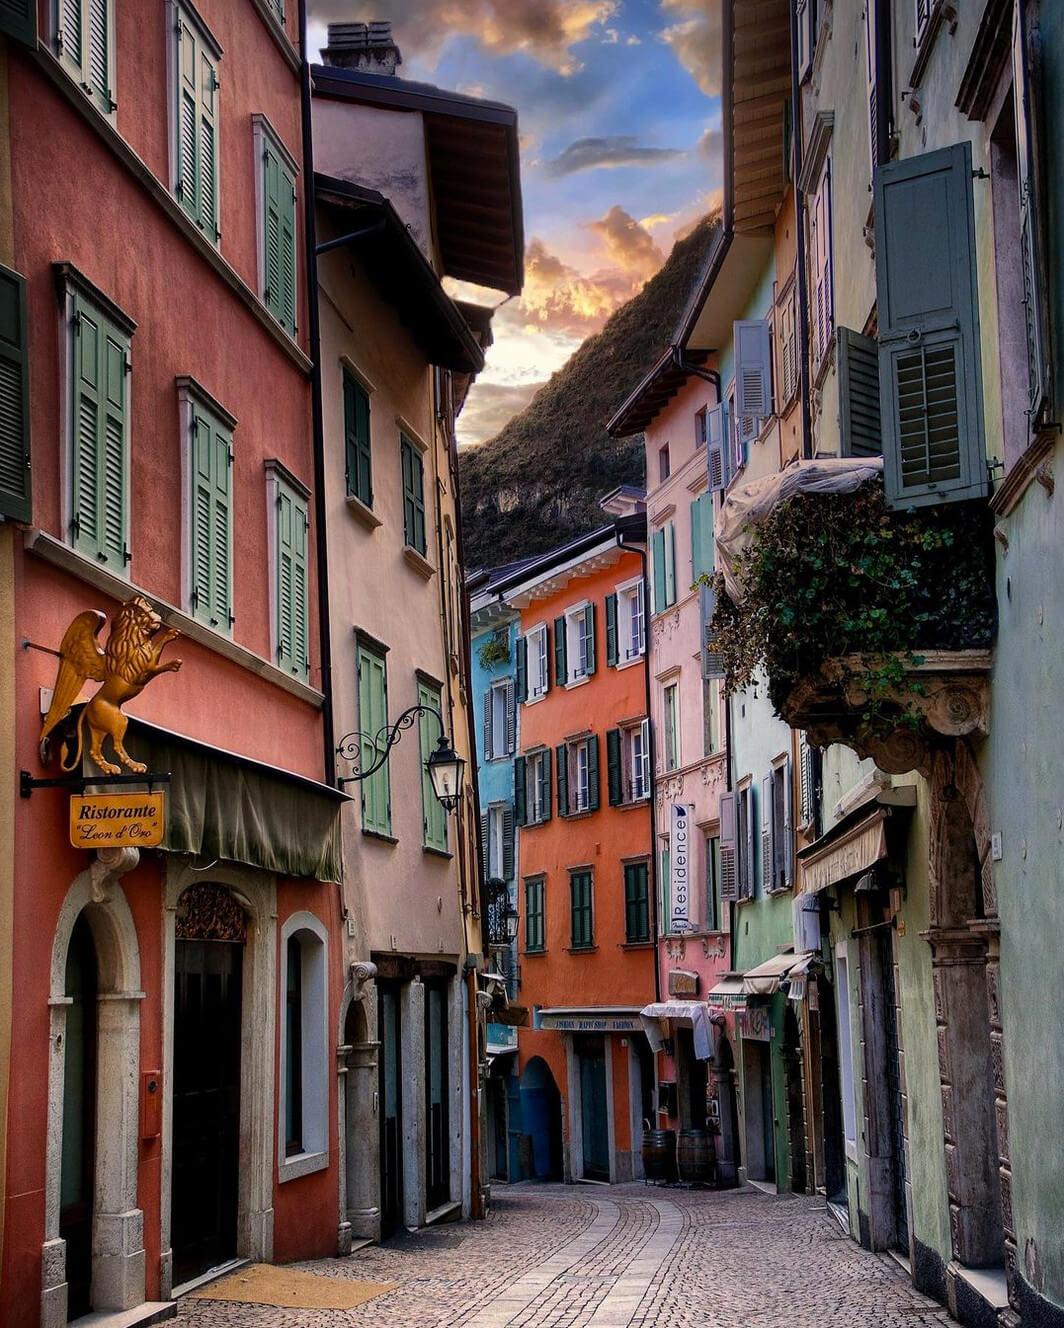 Ihr Besuch in Riva del Garda